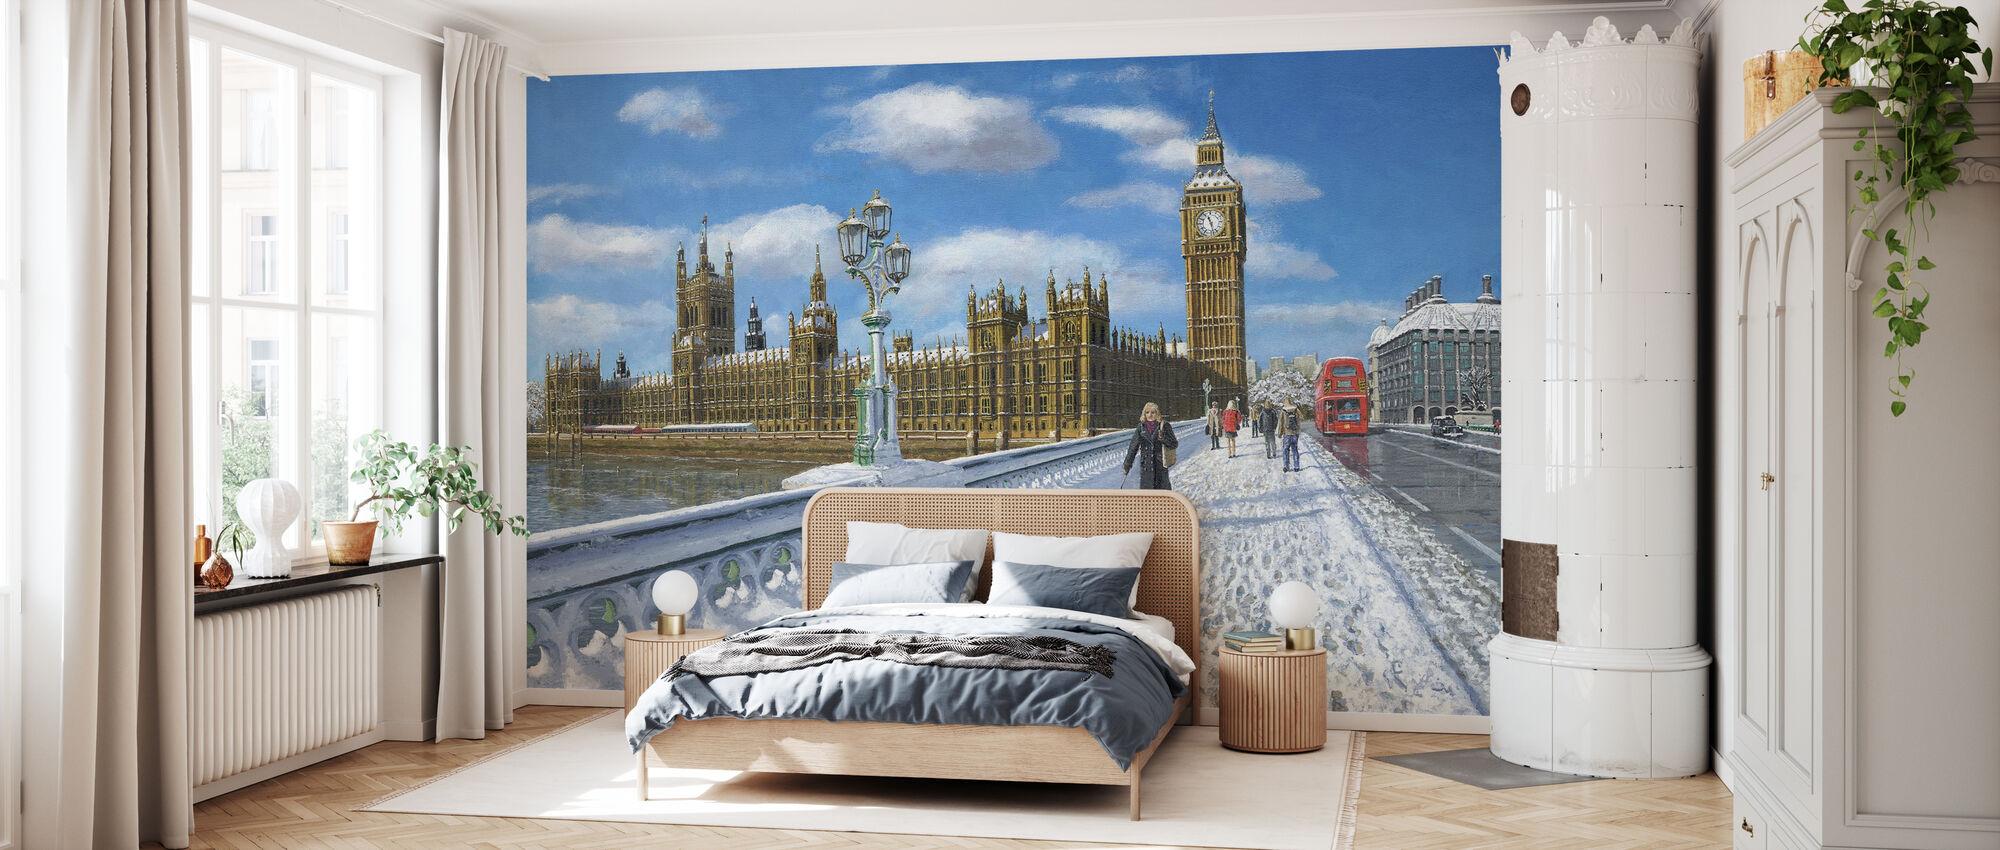 Vintersol Hus i Parlamentet - London - Tapet - Soverom